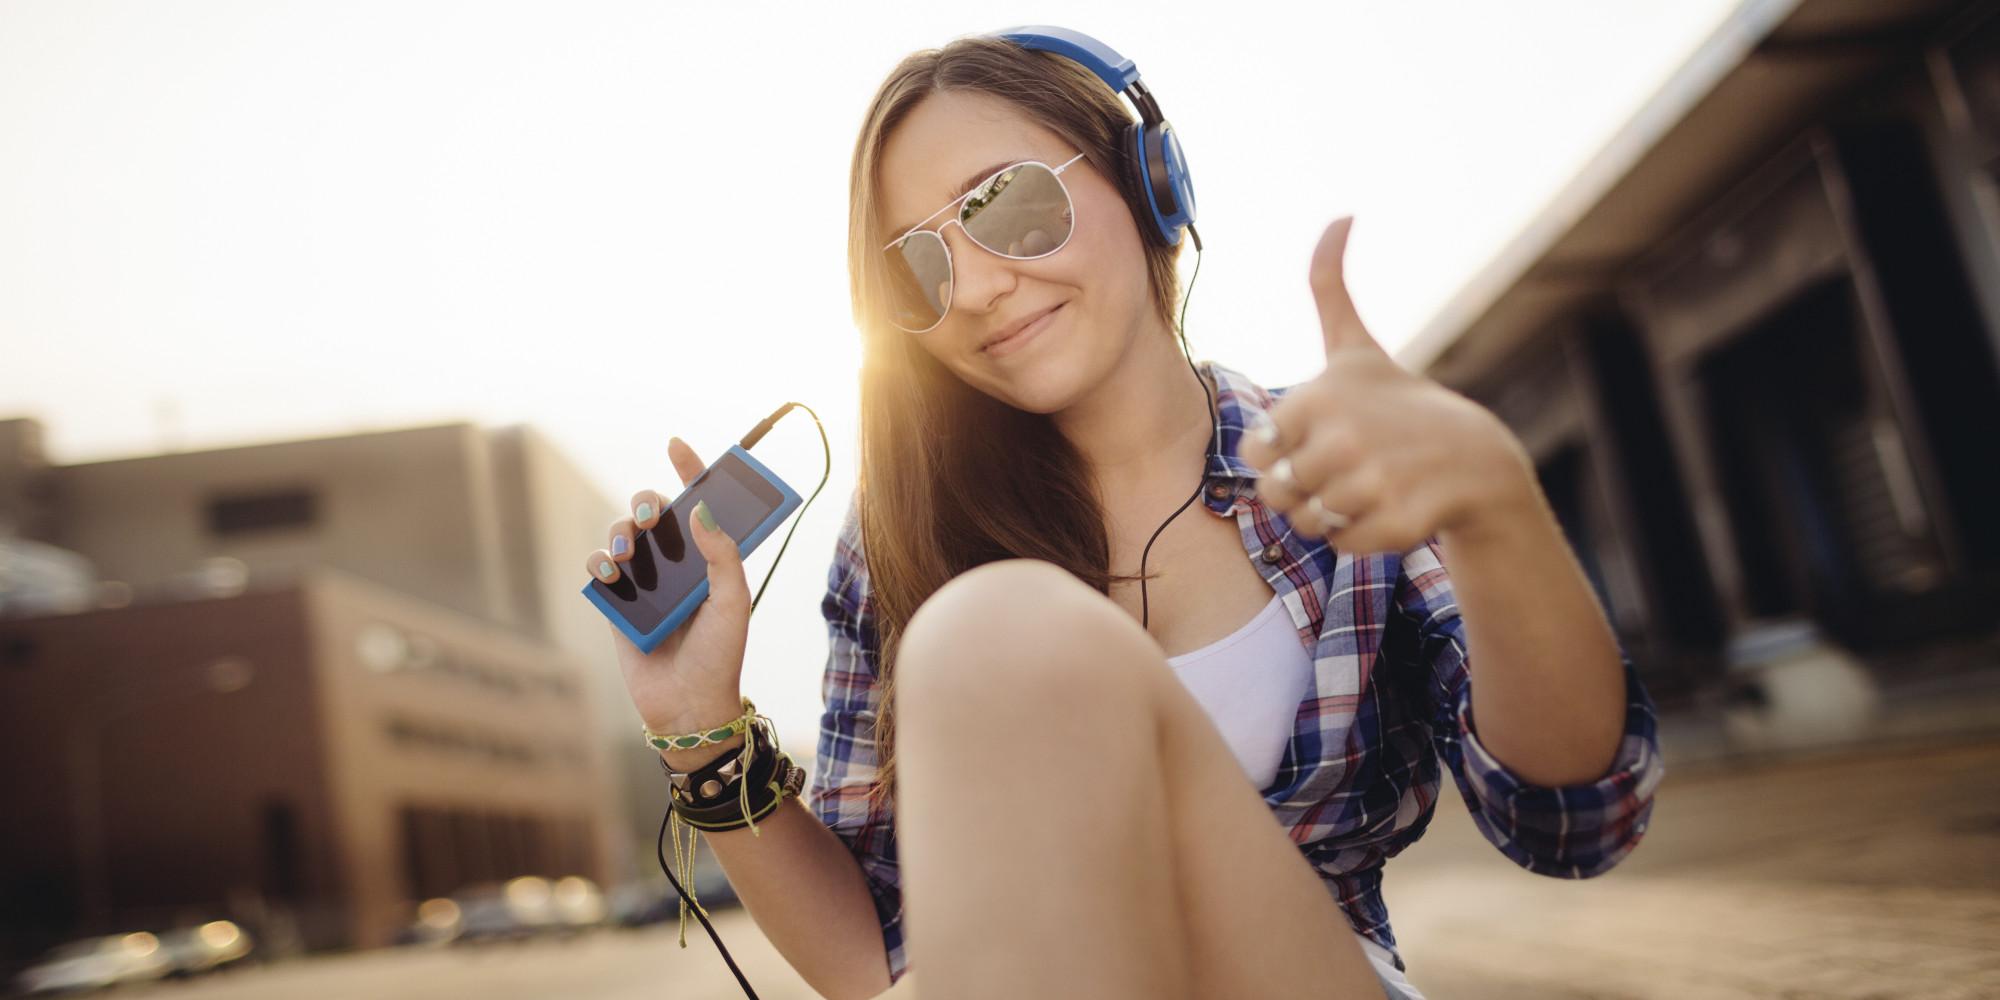 Girl Listening To Headphones Tumblr